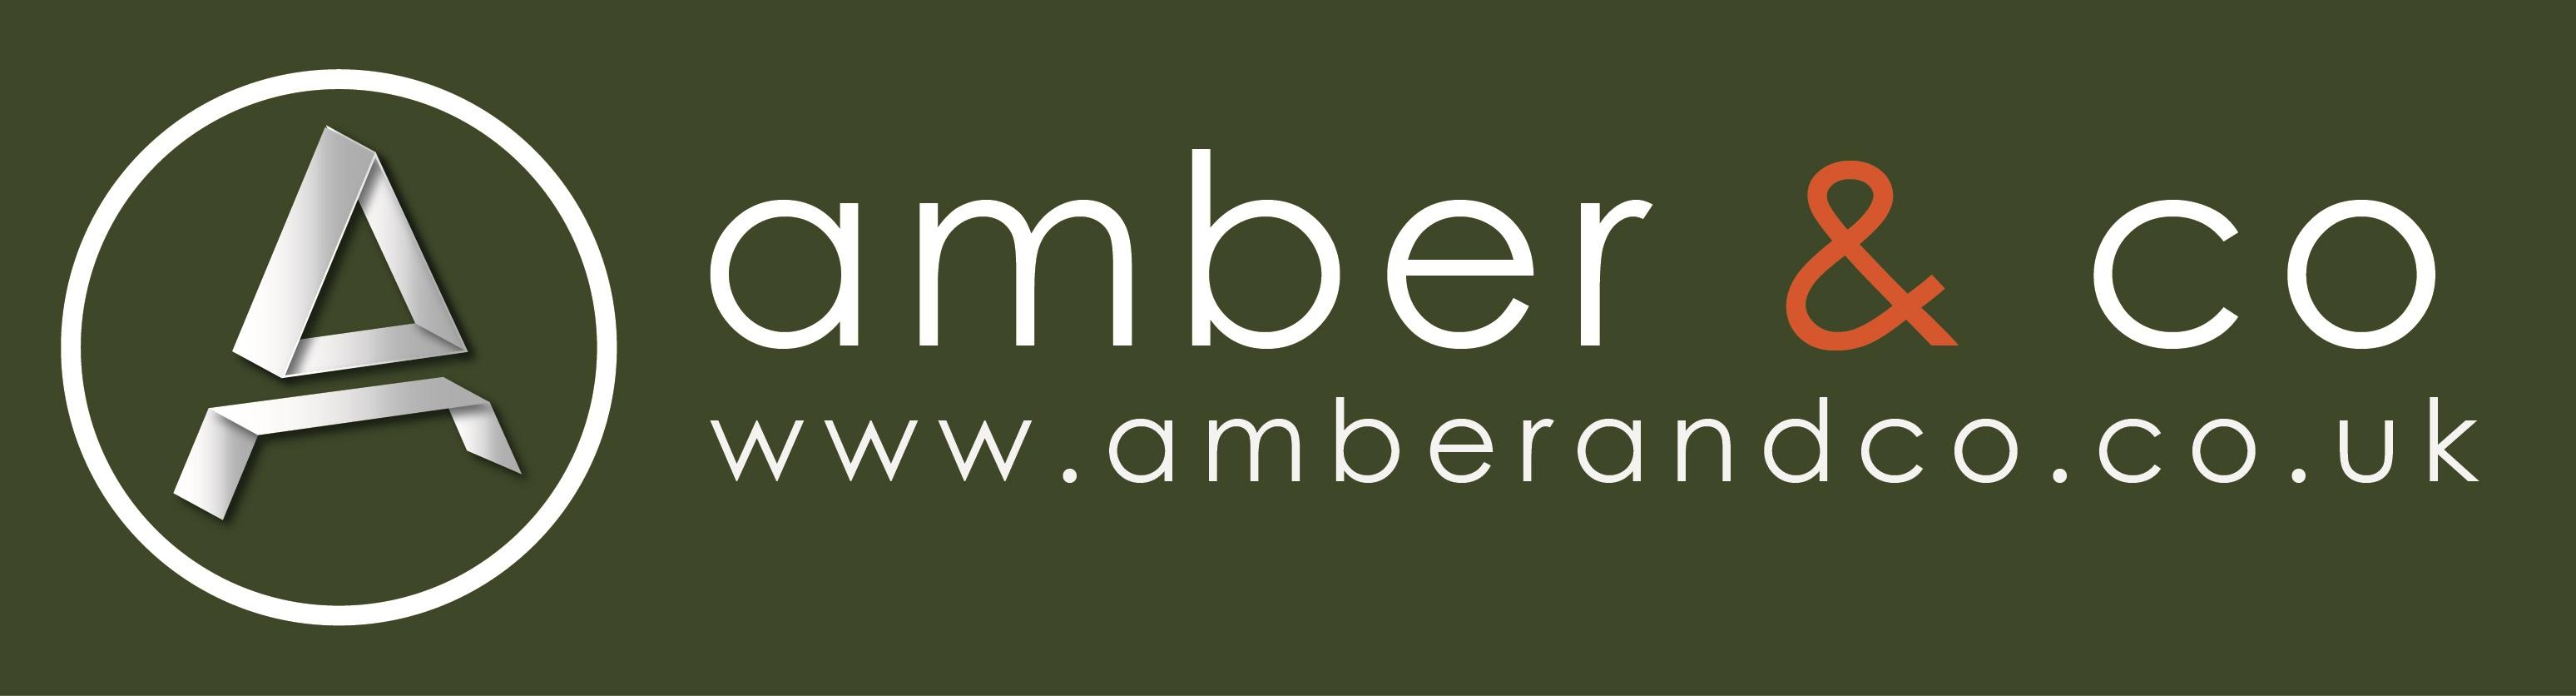 Amber & Co